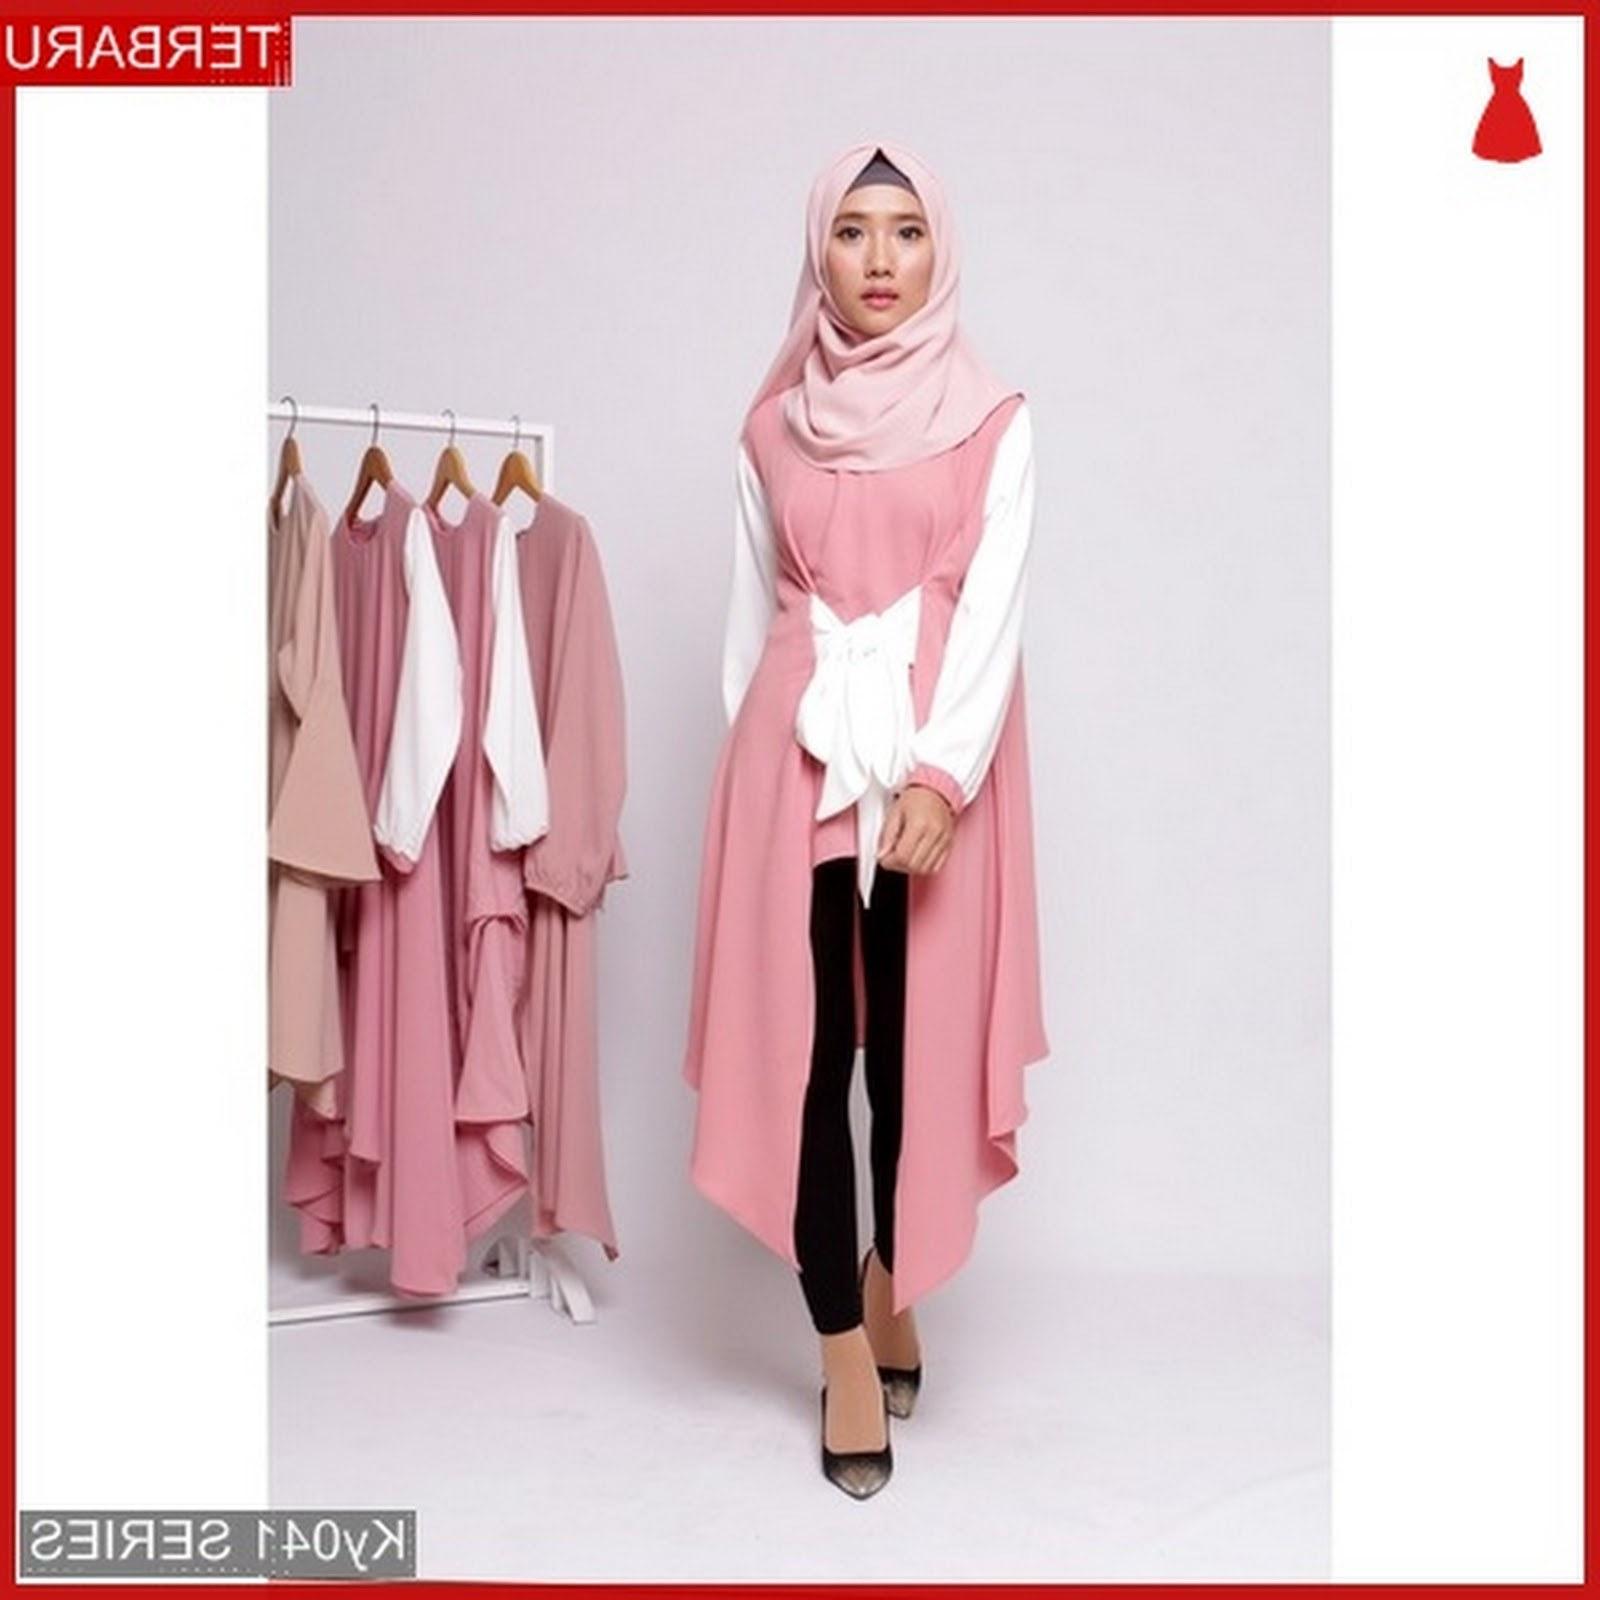 Inspirasi Model Baju Lebaran Tahun 2018 Gdd0 Dapatkan Baju Muslim Lebaran Paling Keren Terbaru Di Bmg